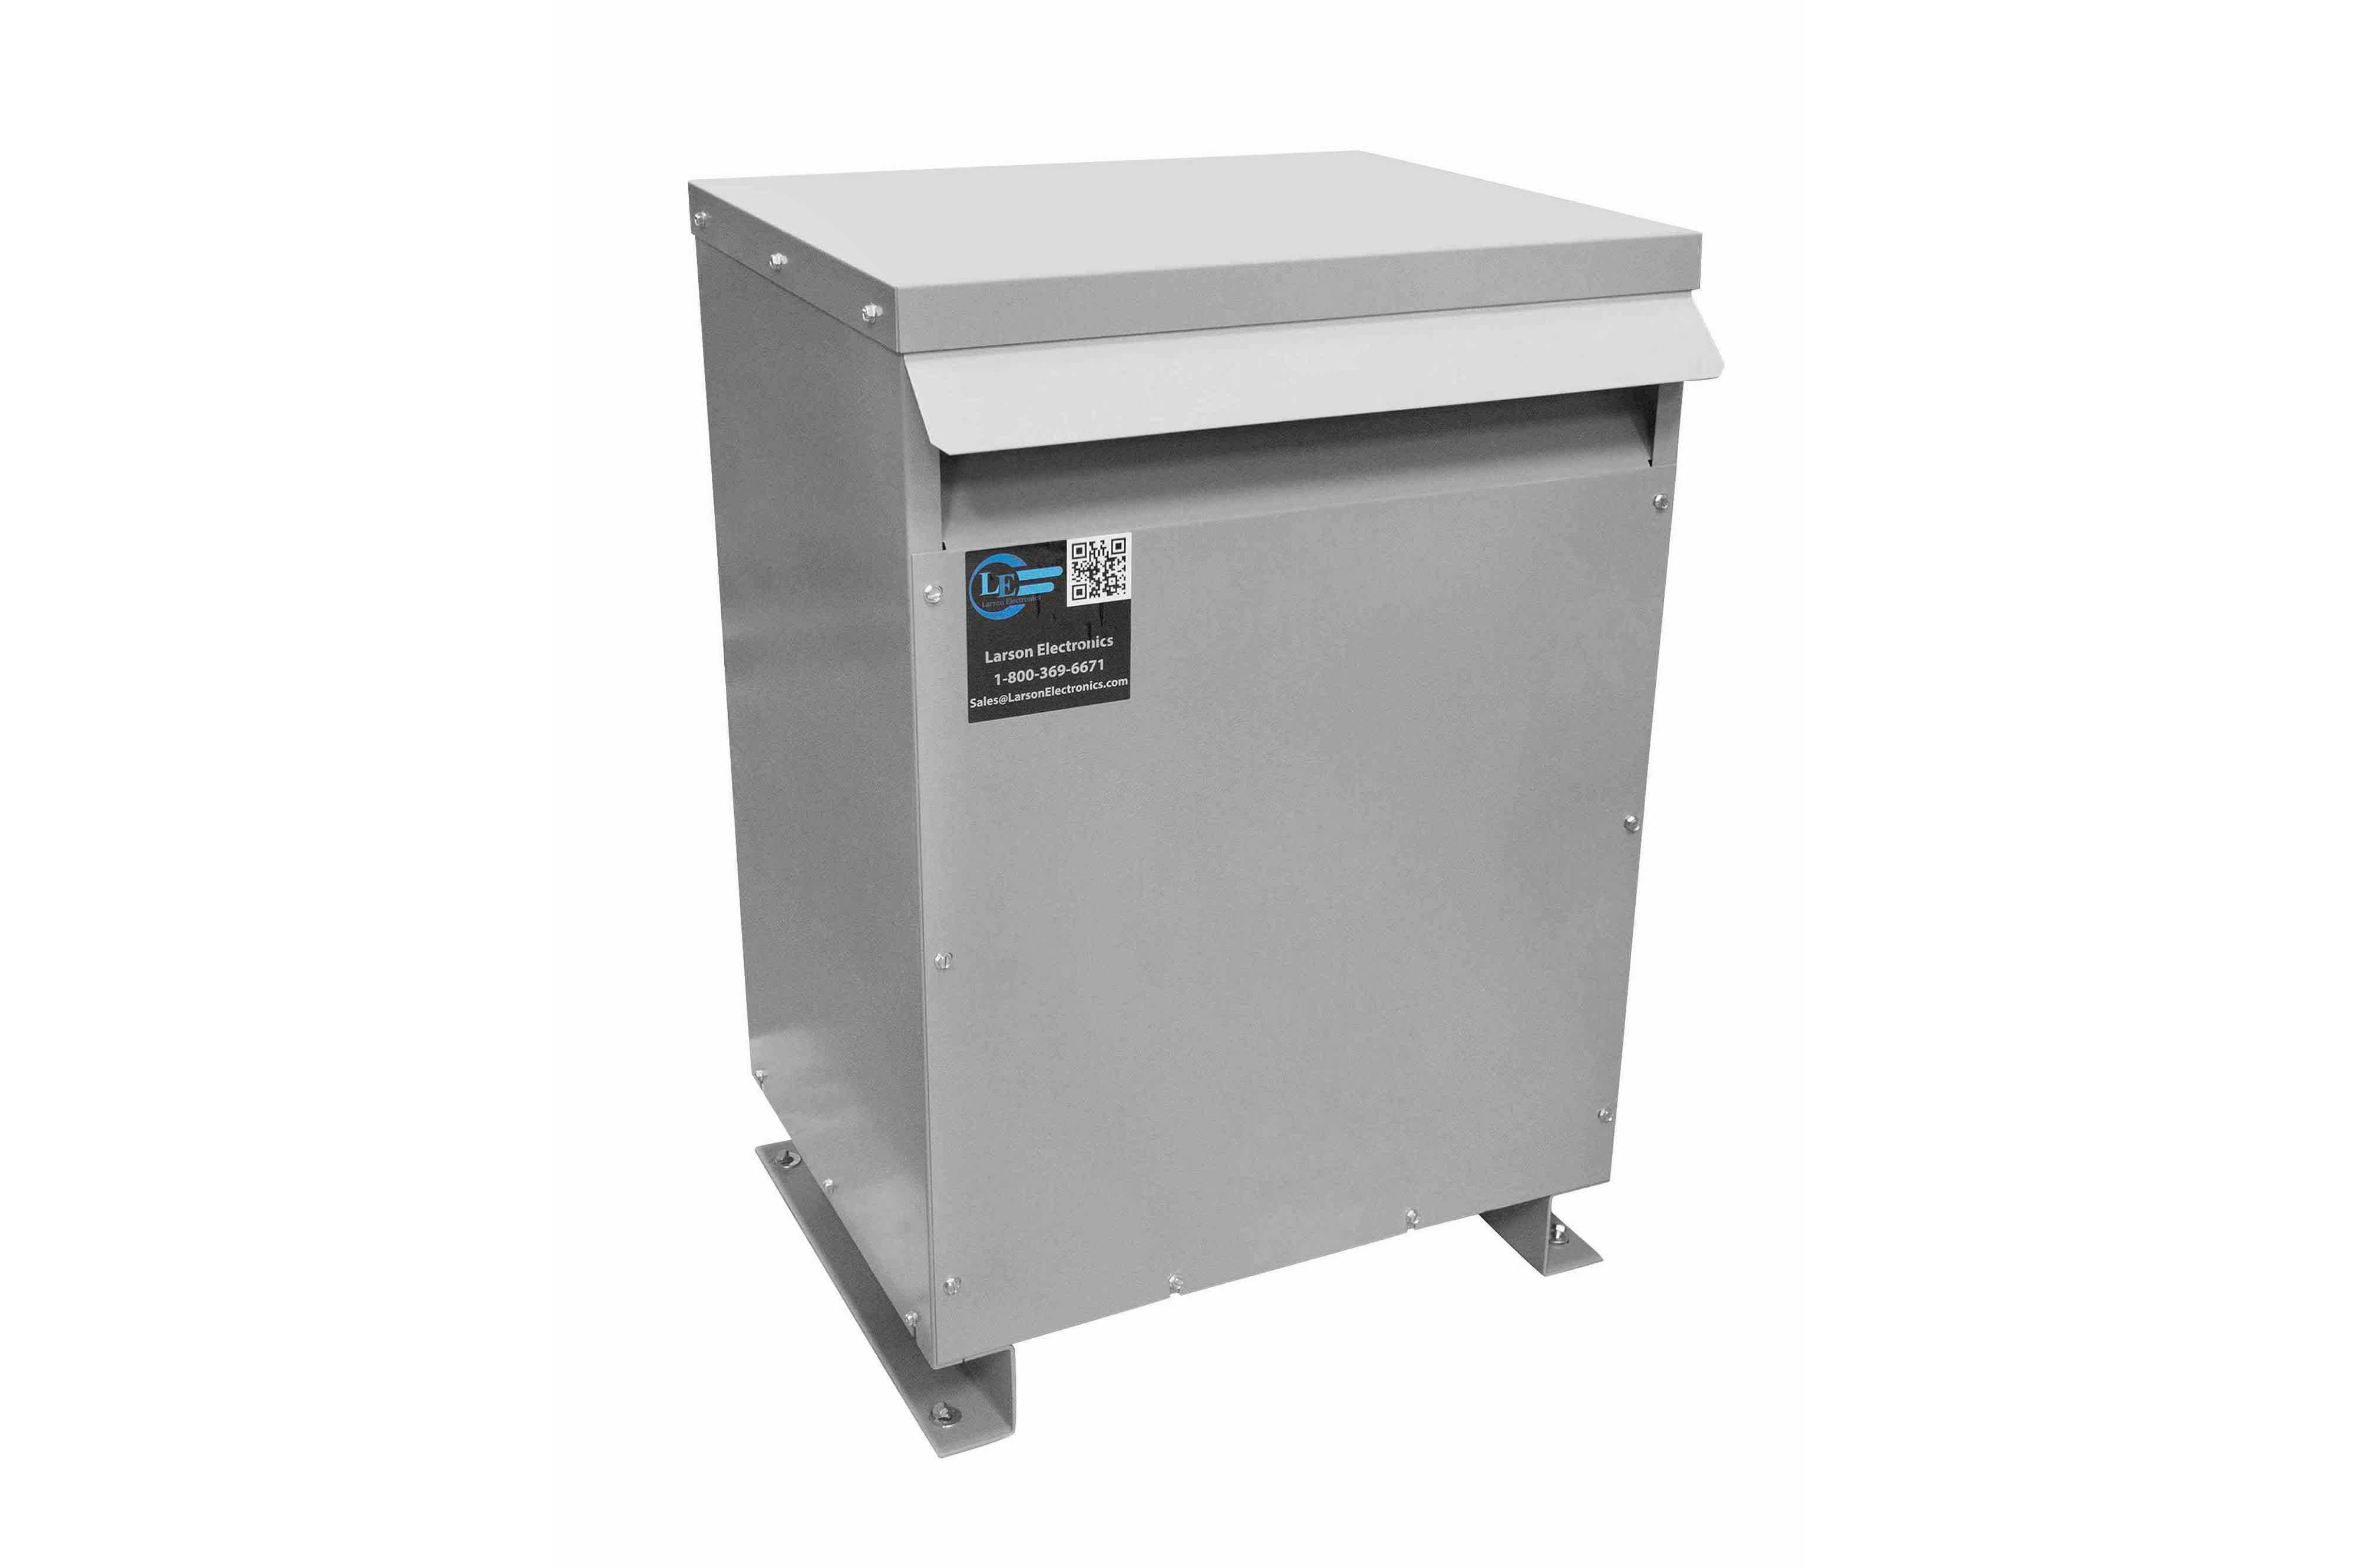 125 kVA 3PH Isolation Transformer, 415V Wye Primary, 600Y/347 Wye-N Secondary, N3R, Ventilated, 60 Hz